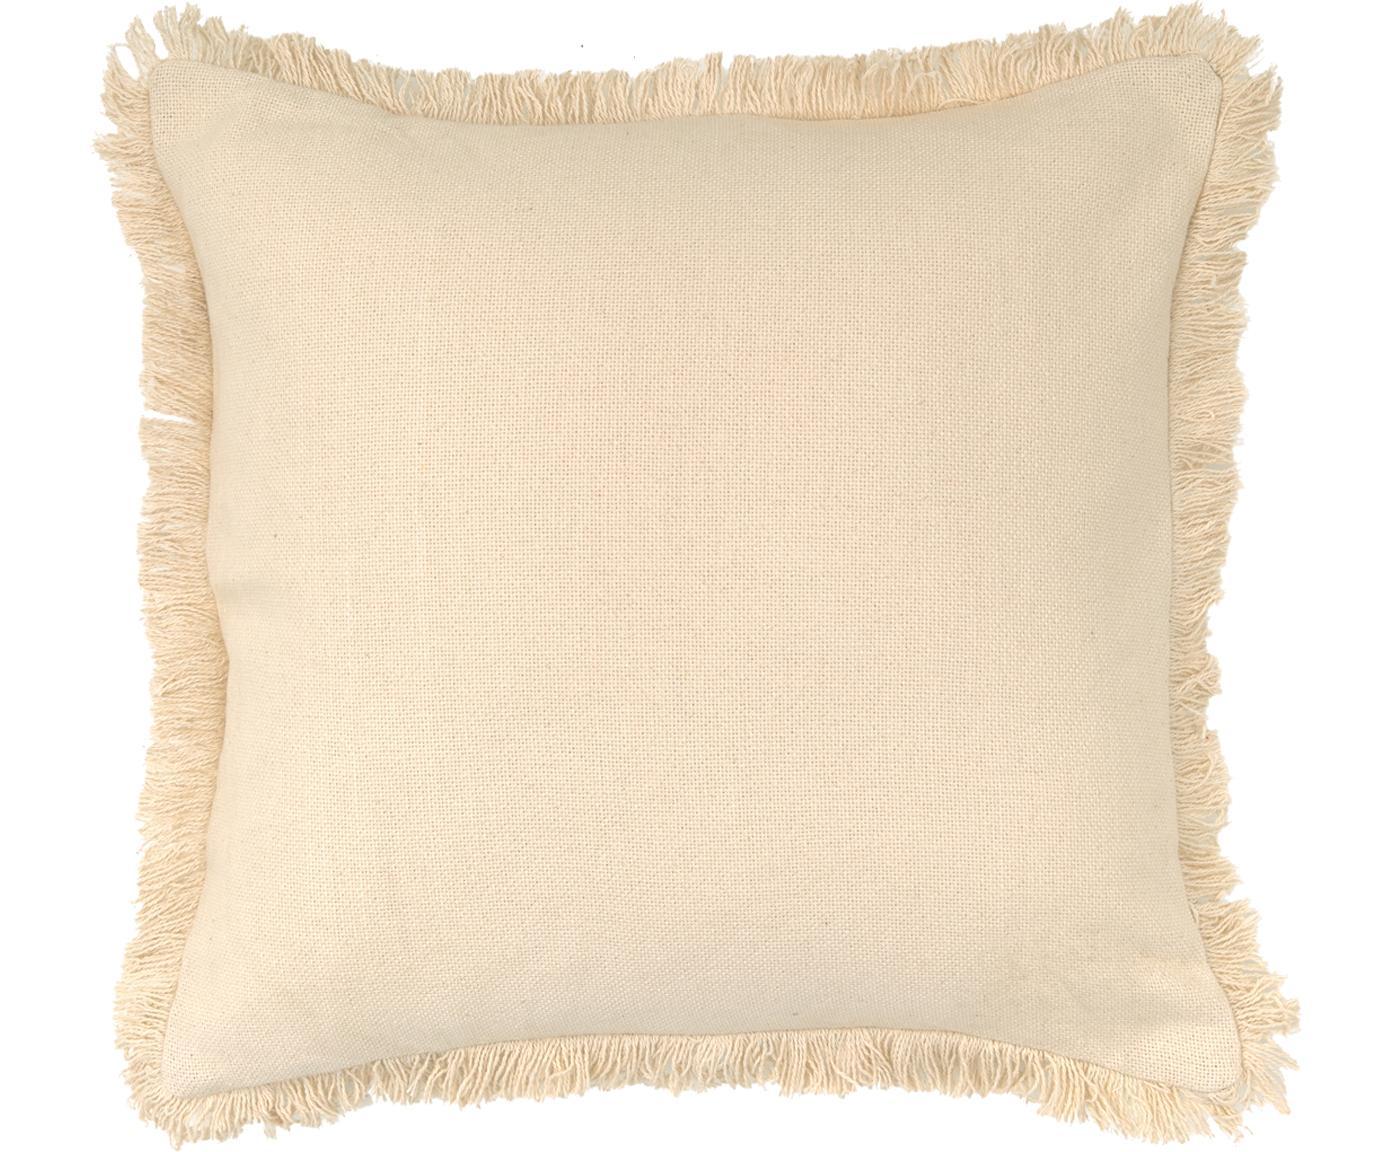 Cuscino con frange e imbottitura Prague, Retro: cotone, Bianco latteo, Larg. 40 x Lung. 40 cm